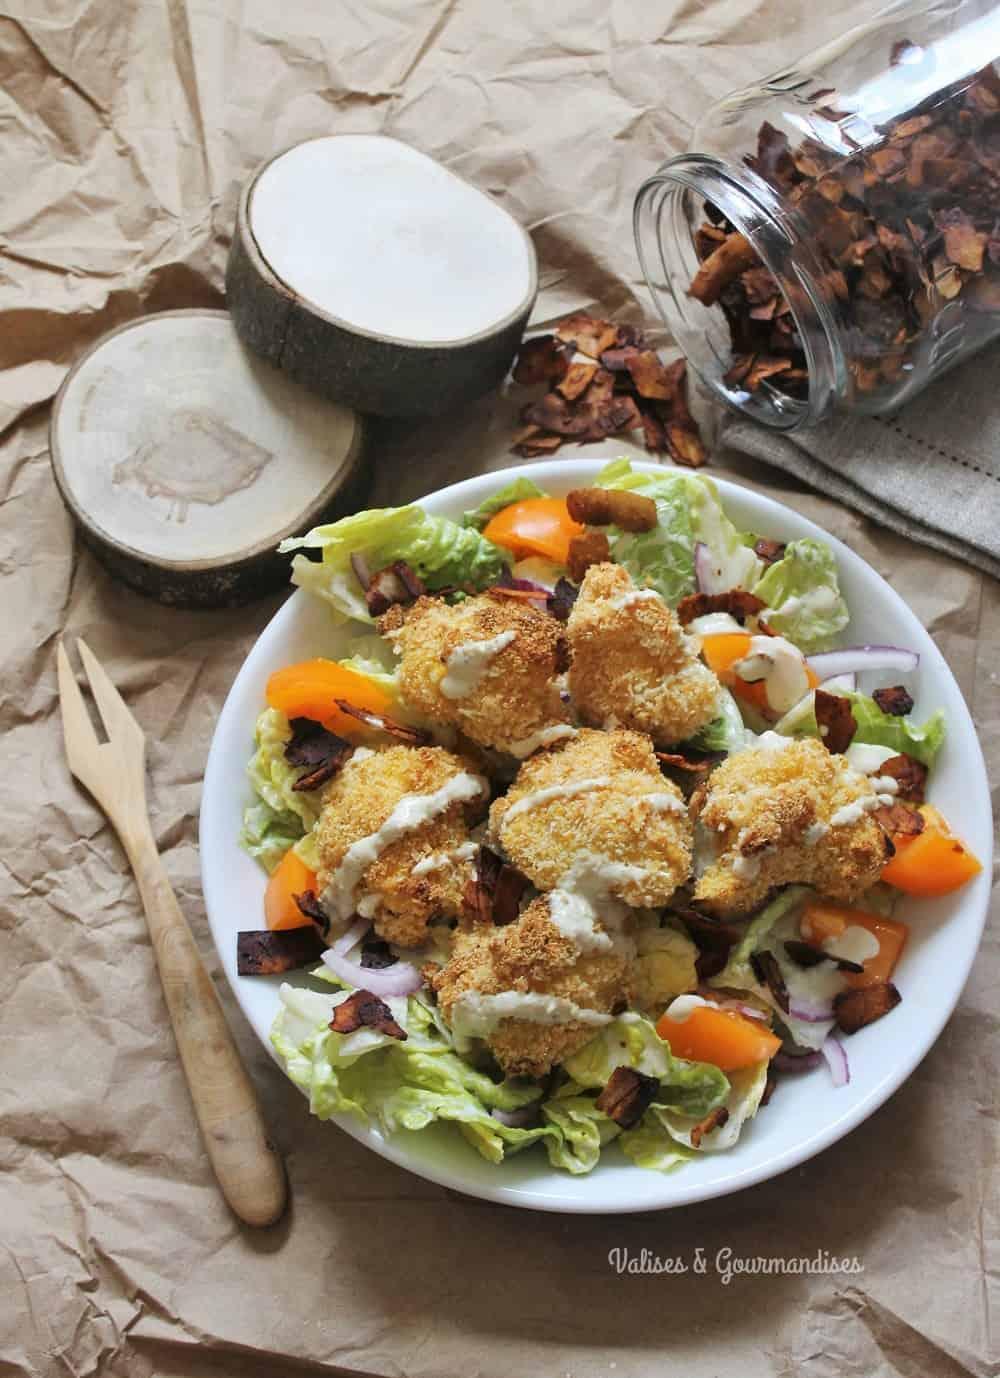 Vegan caesar salad with oven-baked cauliflower